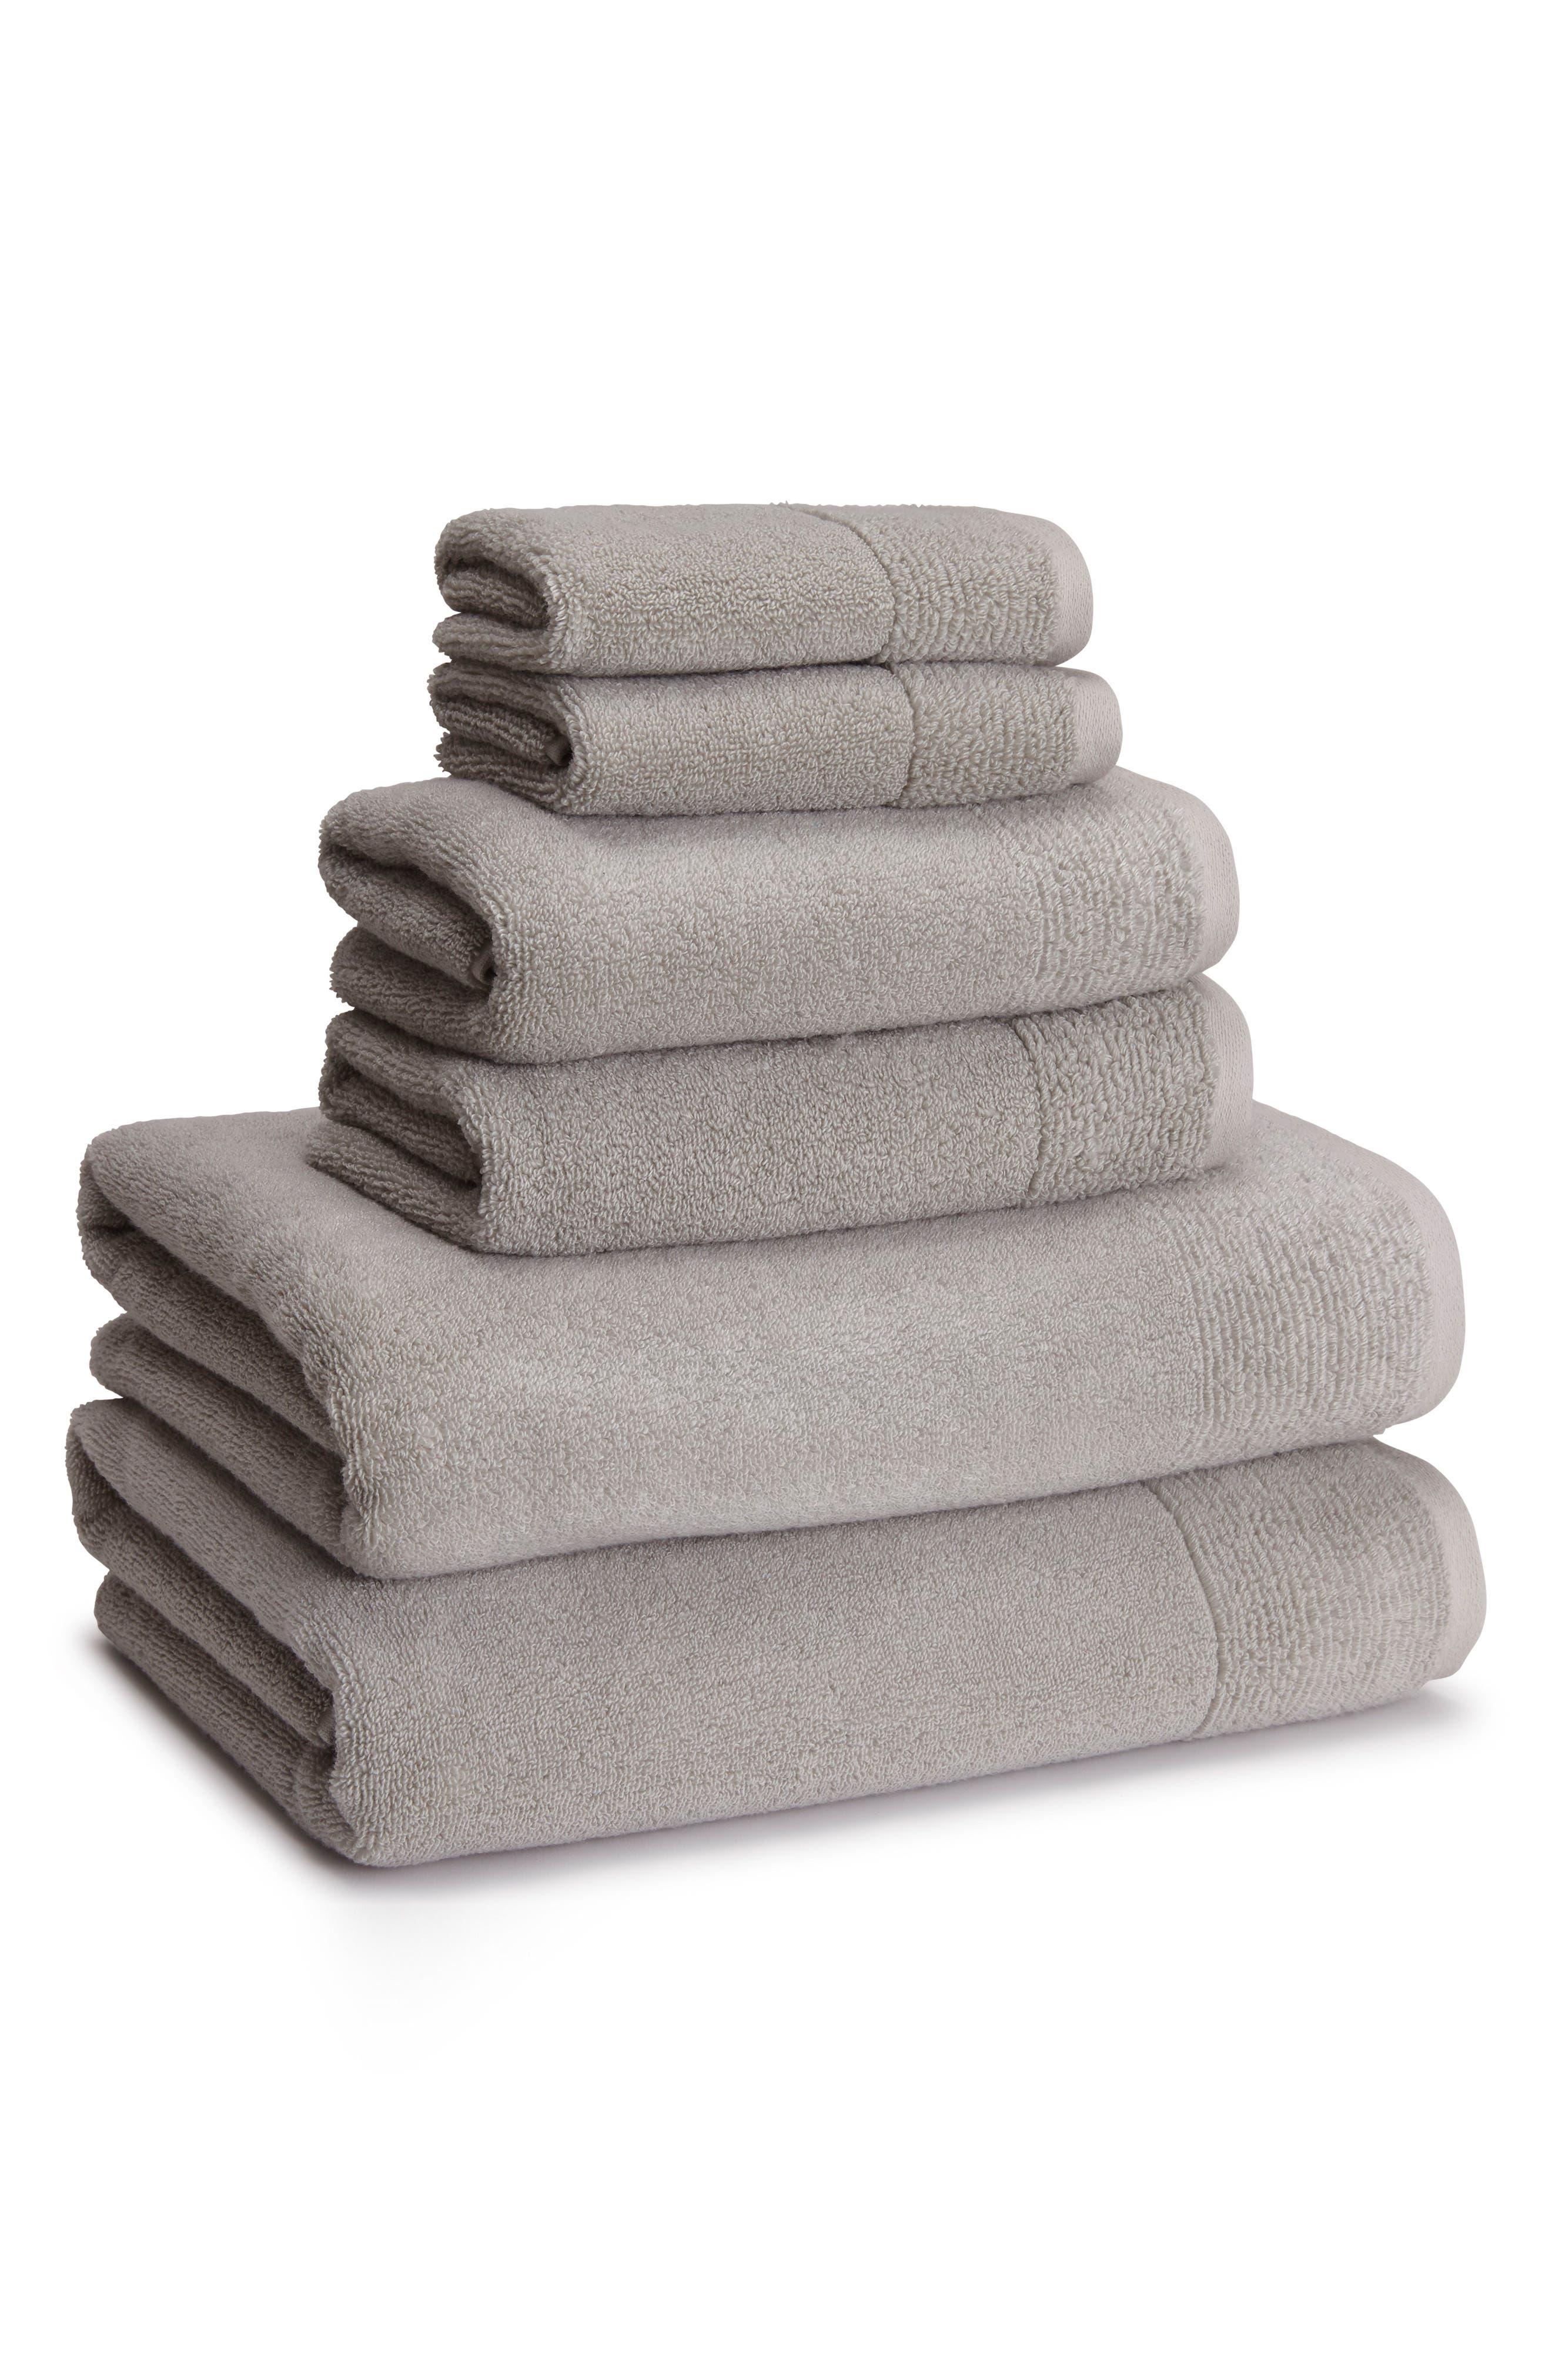 Alternate Image 1 Selected - KASSATEX Kyoto Wash Towel